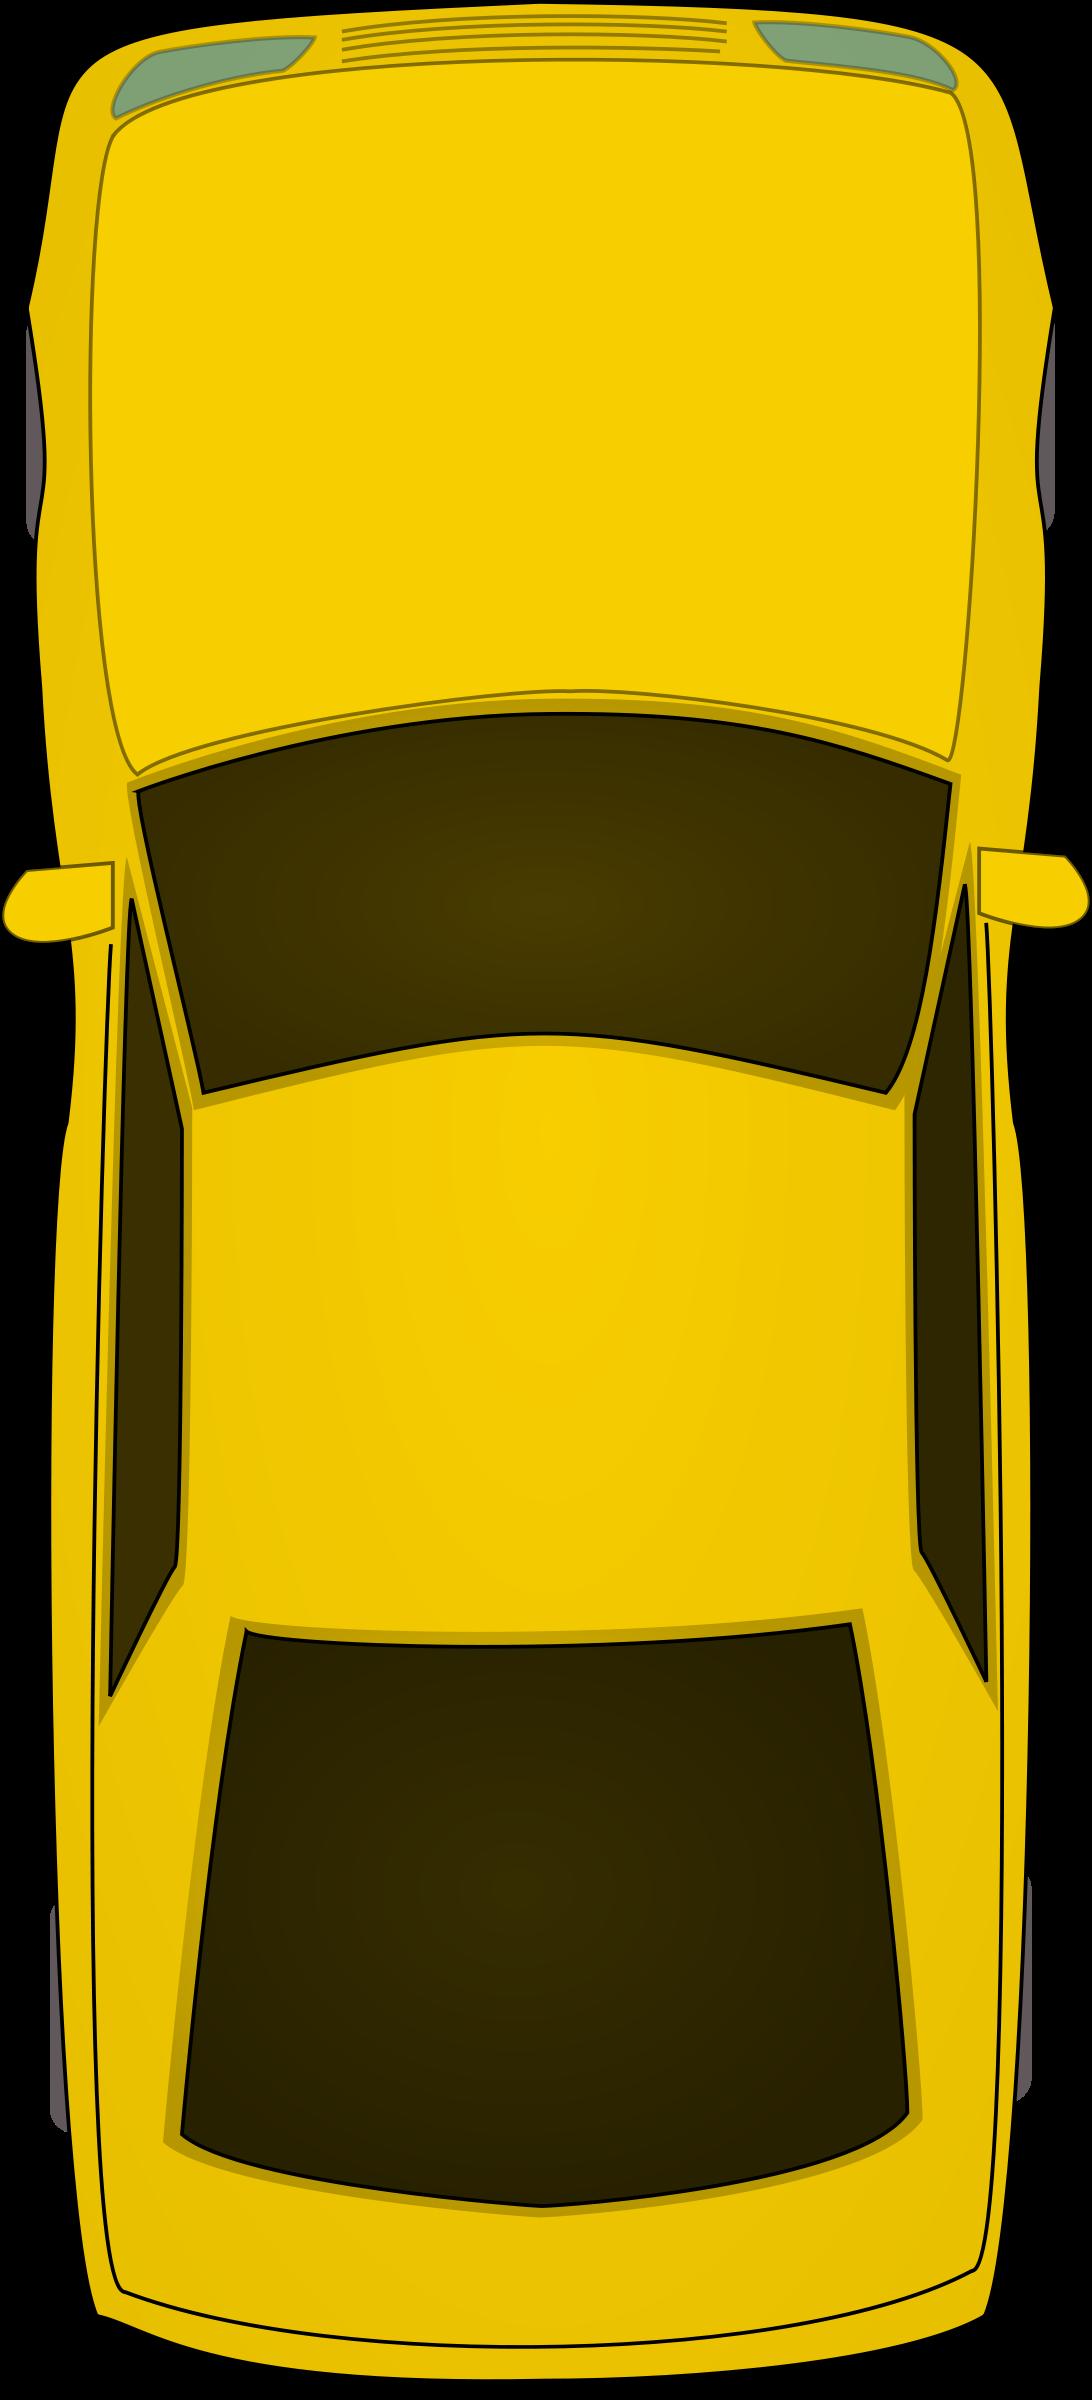 Car drawing at getdrawings. Minivan clipart top view